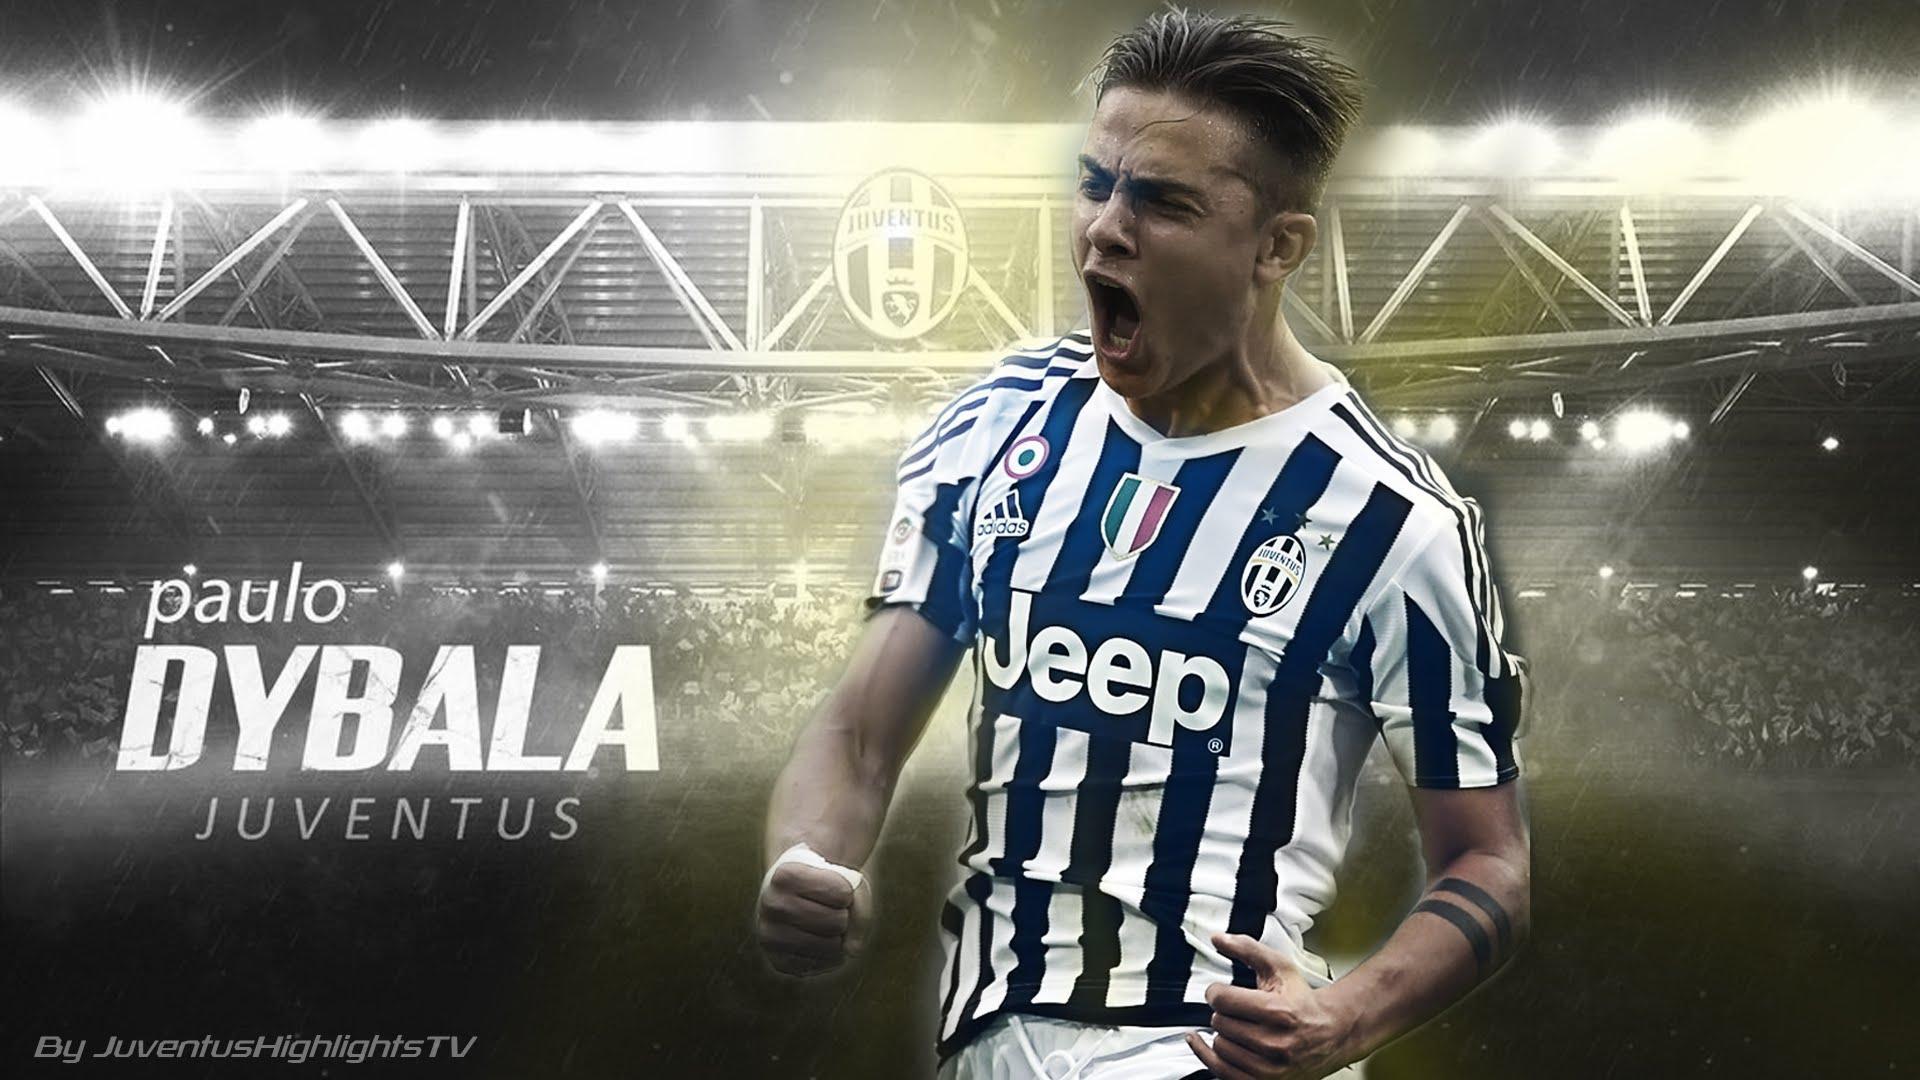 Gambar Wallpaper HD Terbaru Paulo Dybala Musim 2016/2017 | Sexy Bola